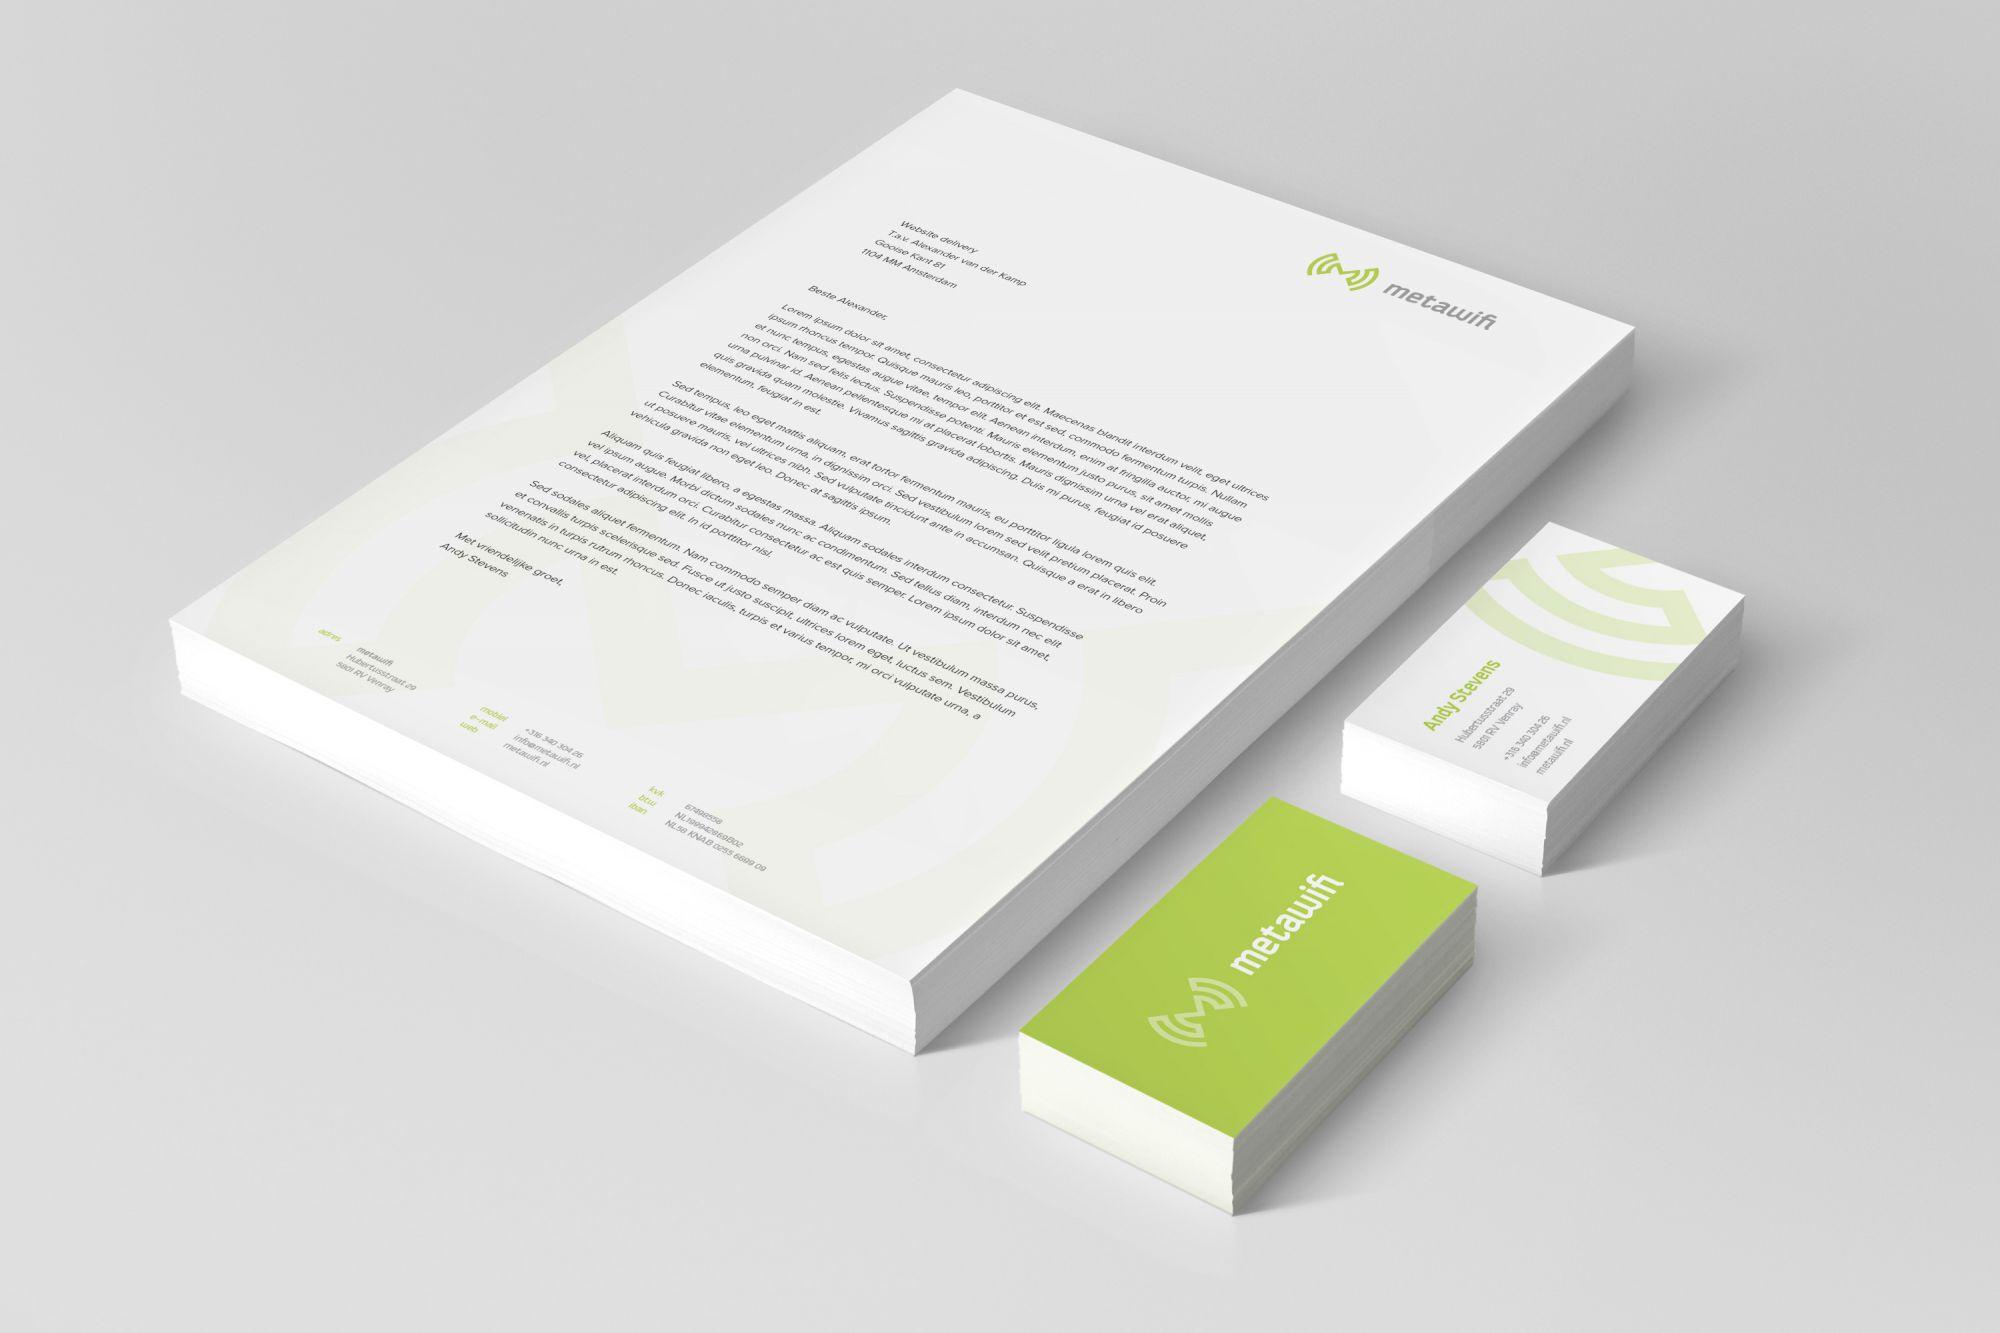 Briefpapier en visitekaartjes MetaWifi